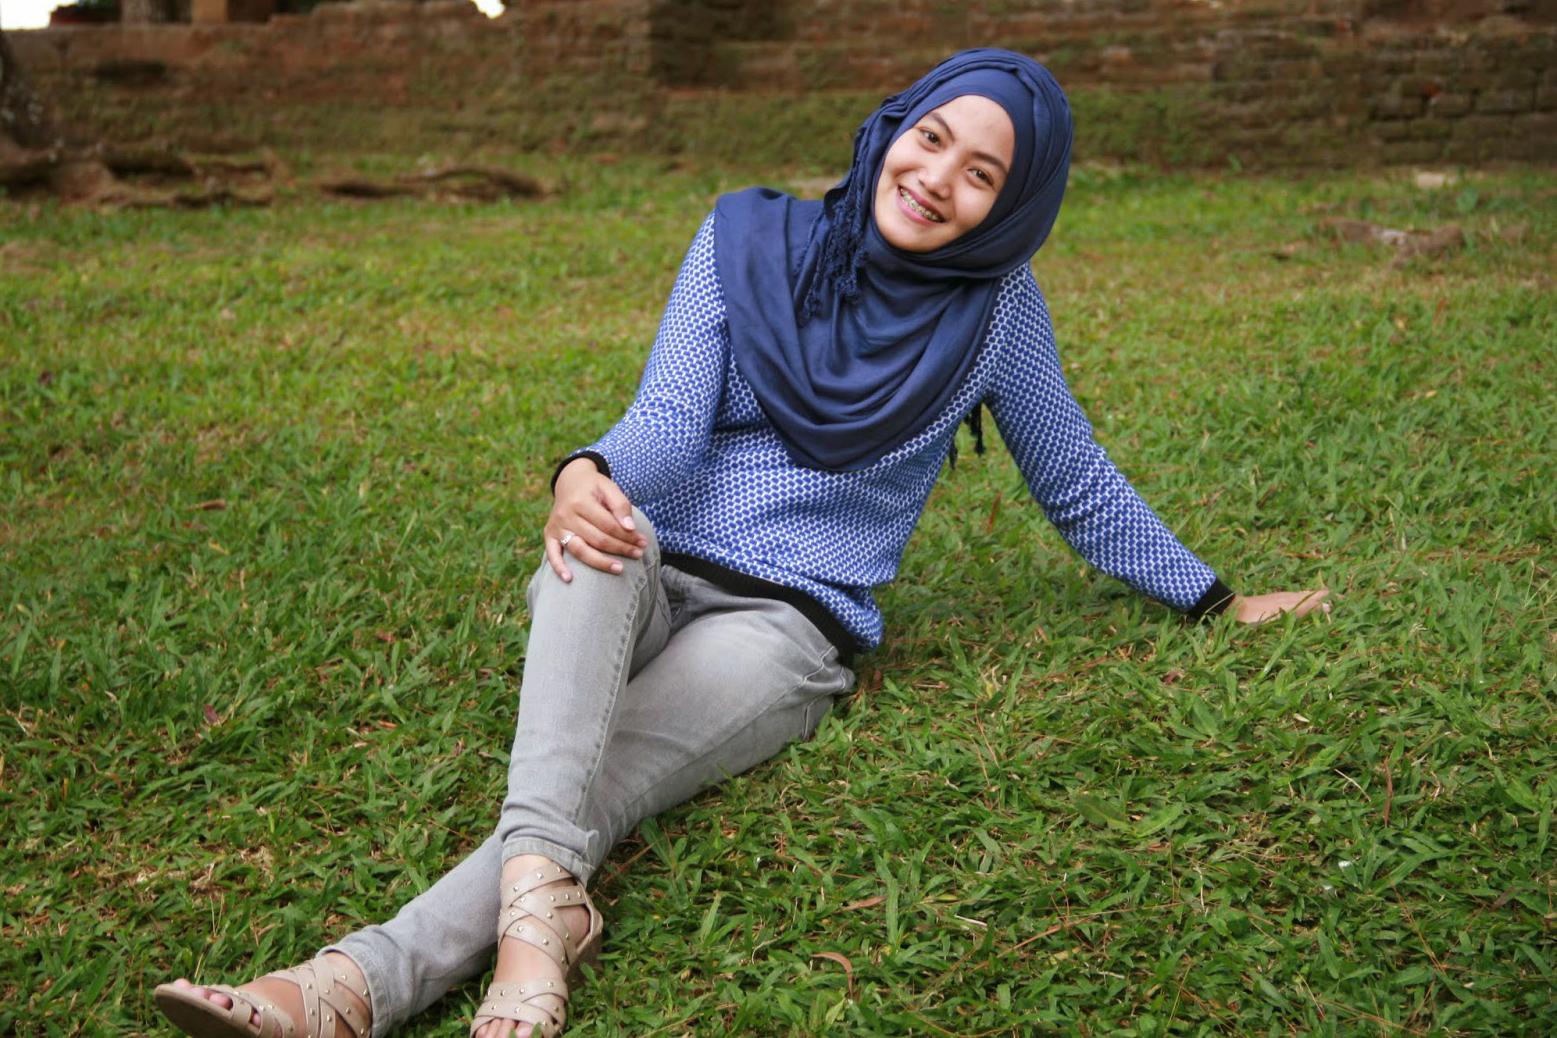 masterchef season 6 hijab Cewek IGO Efrida Yanti hijab Cewek IGO Efrida Yanti 70an hijab Cewek IGO Efrida Yanti 7/8